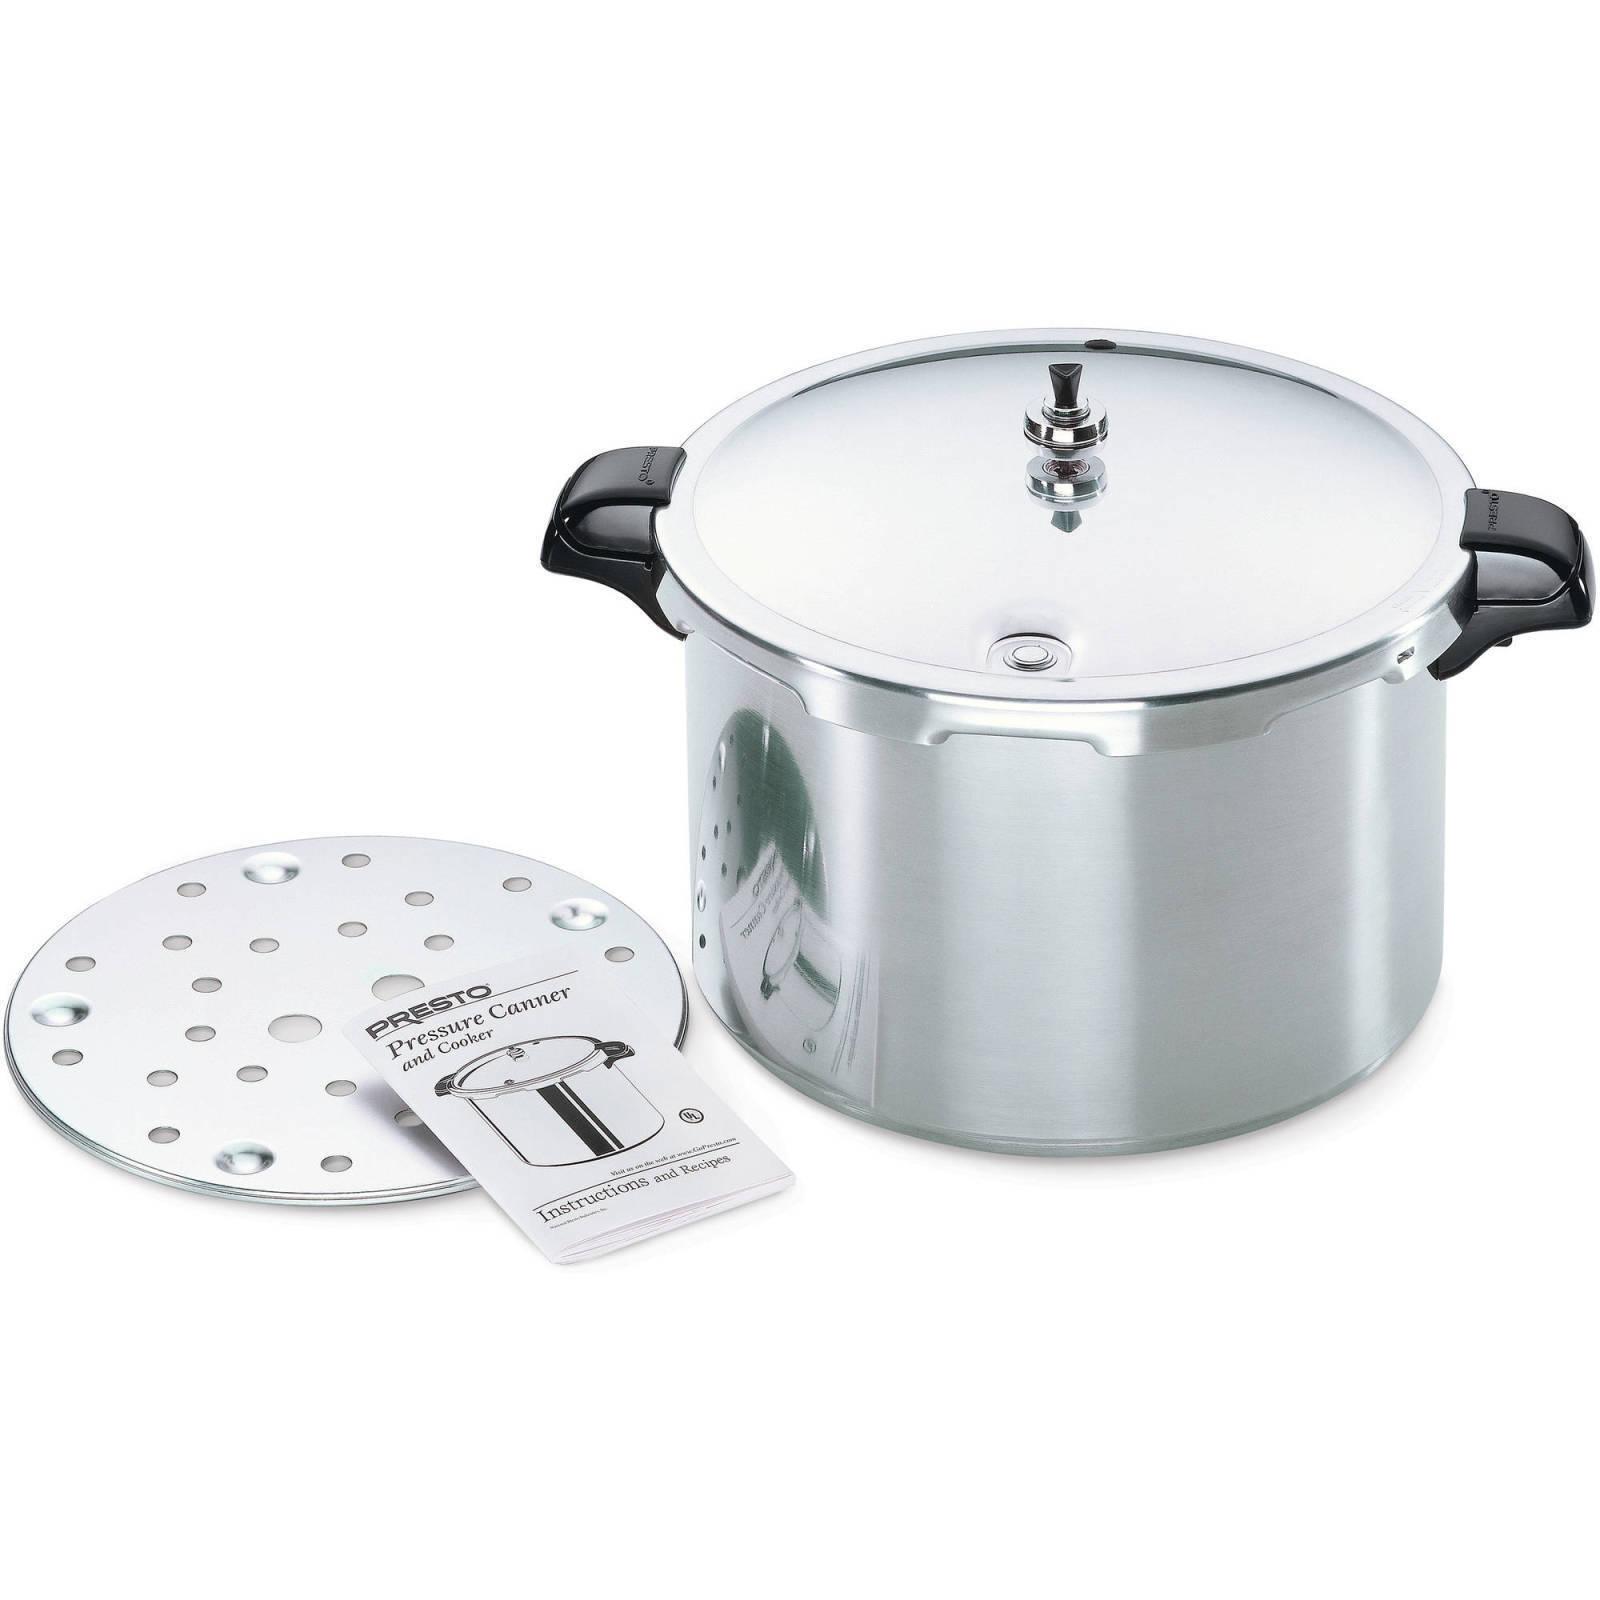 Kitchen Cookware Pressure Canner and Cooker Presto 16-Quart Durable Aluminum